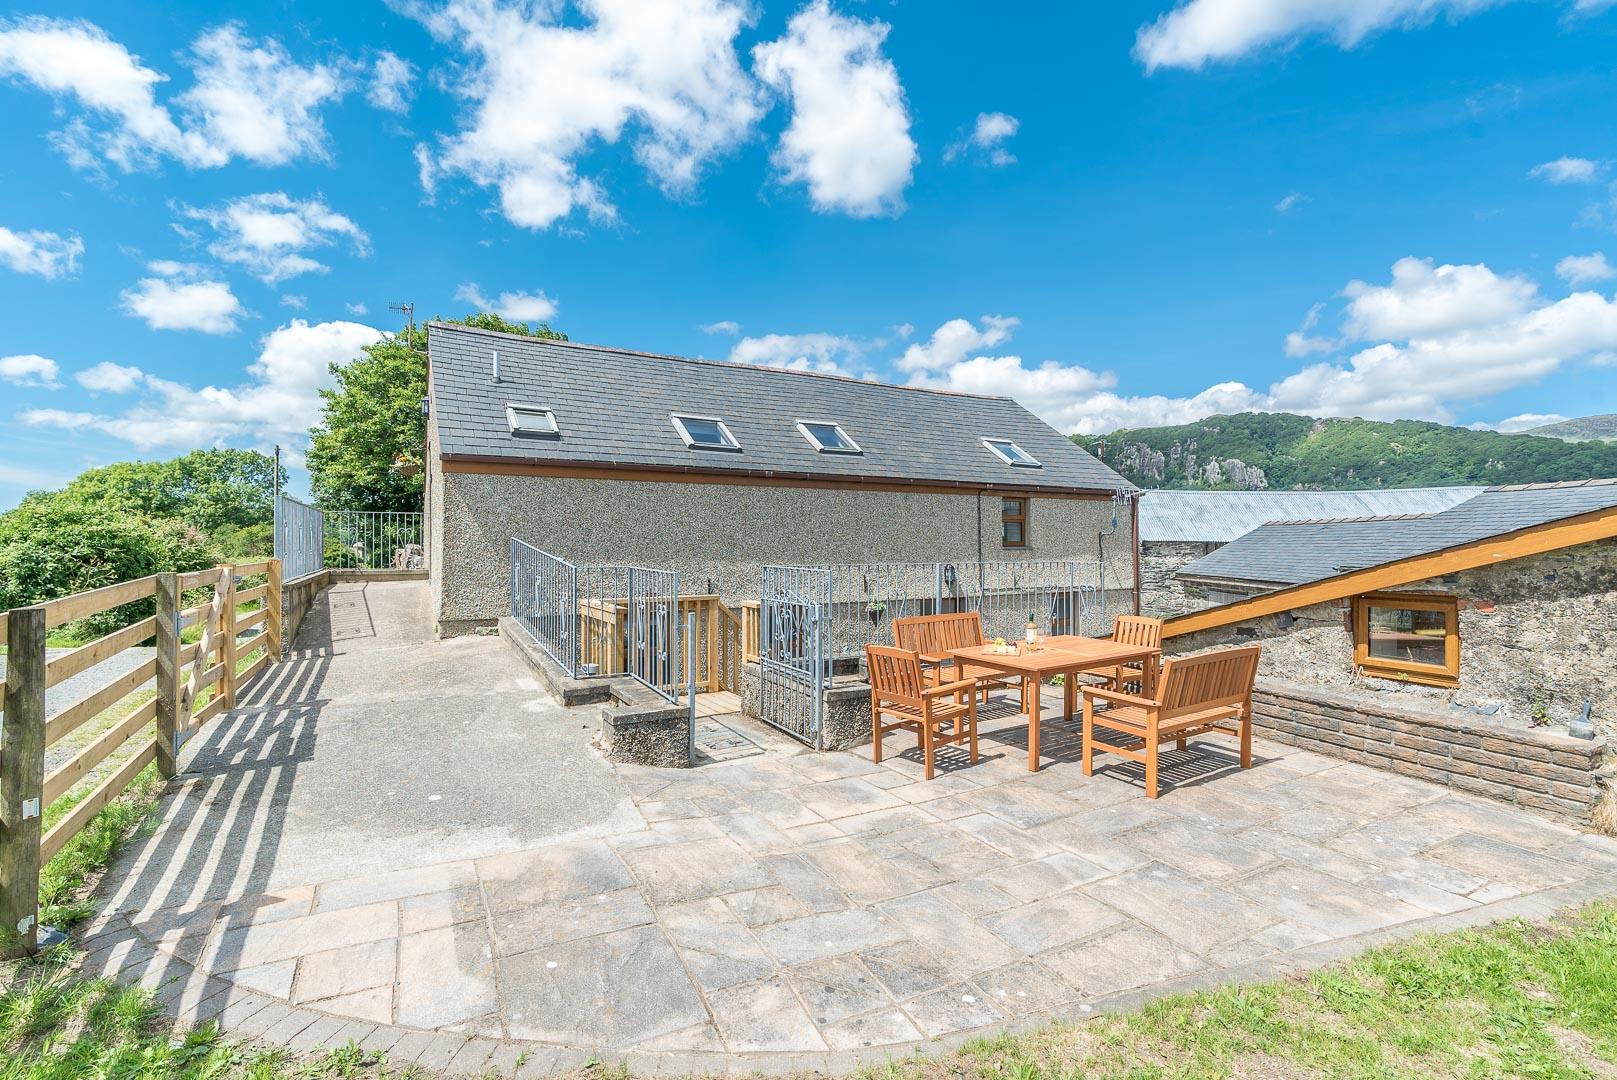 Three Bedroom Farm Holiday Cottage in Porthmadog   Llofft-Talar